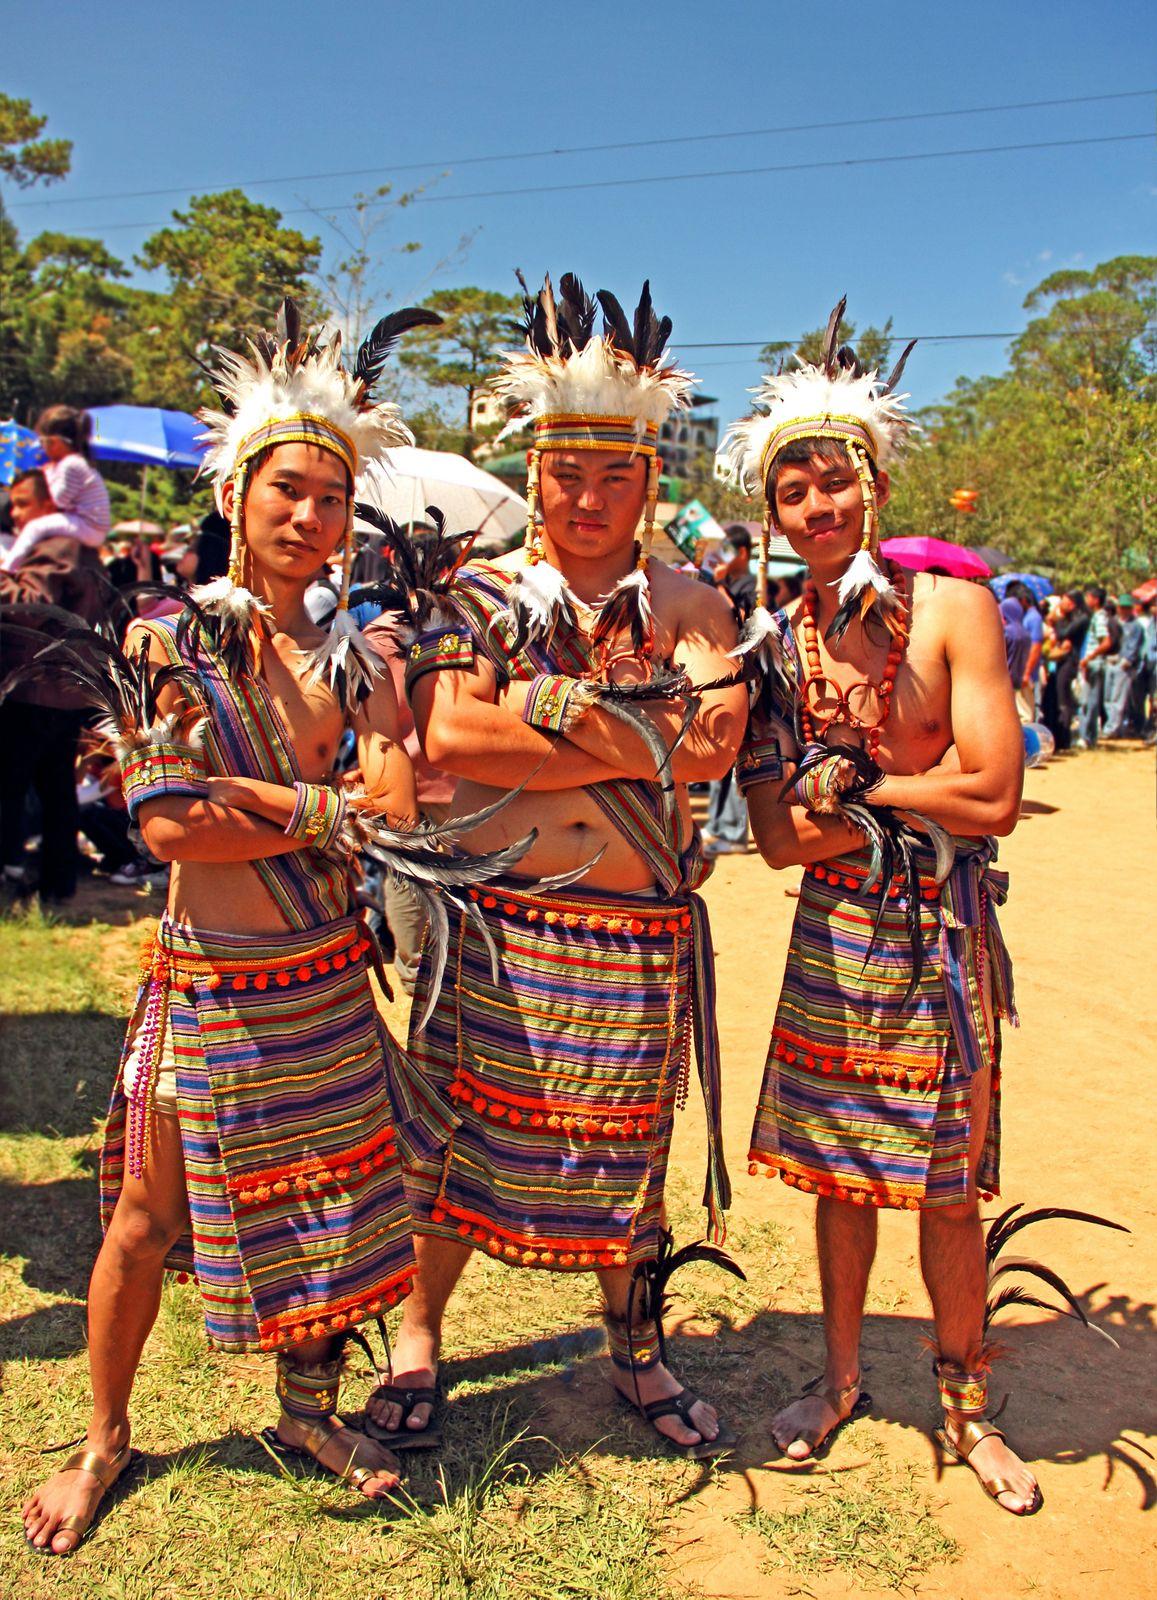 Walking Distance Amp Et Cetera Filipino Costumes